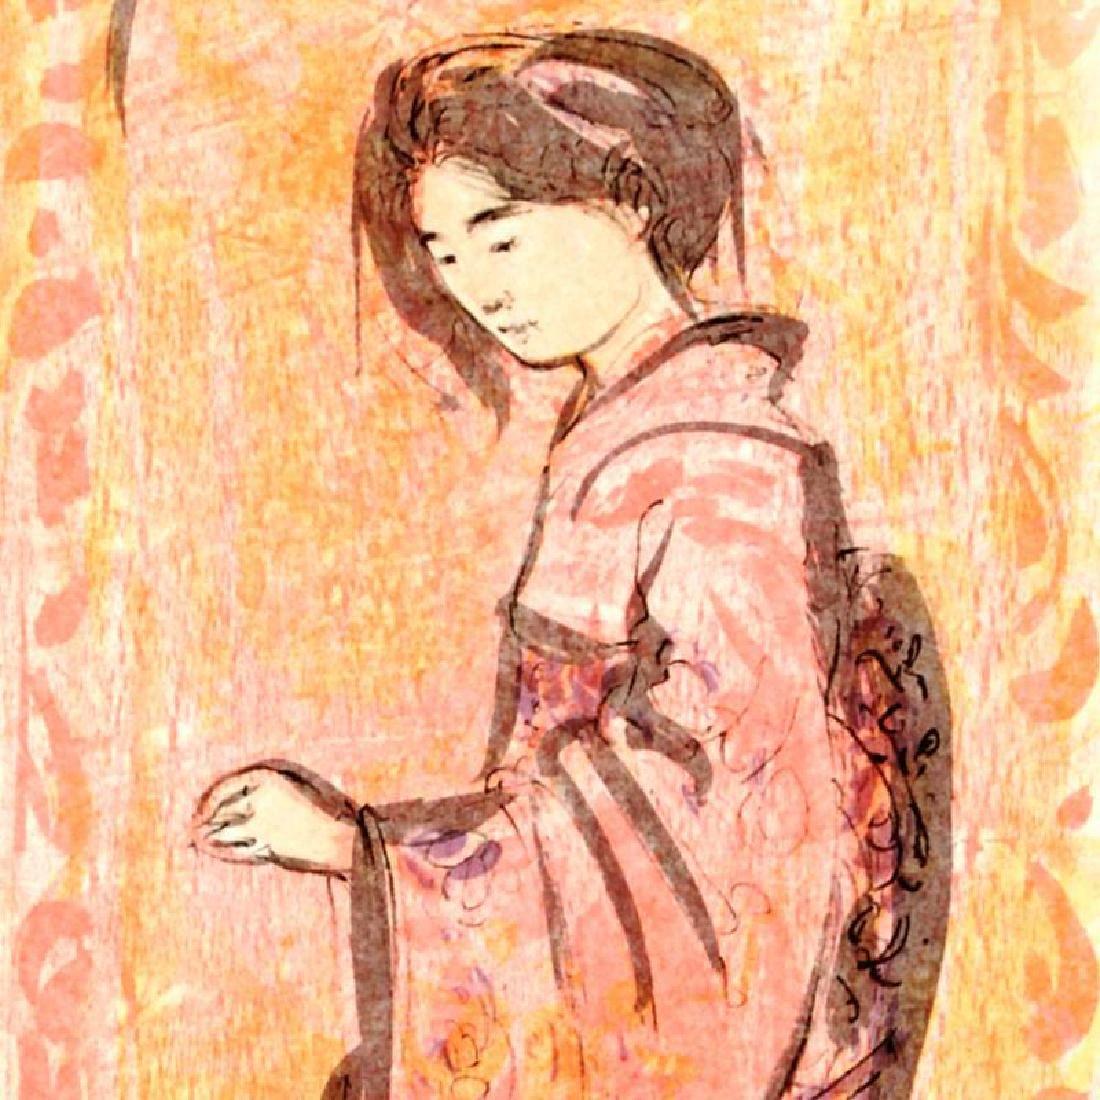 Ume by Hibel (1917-2014) - 2